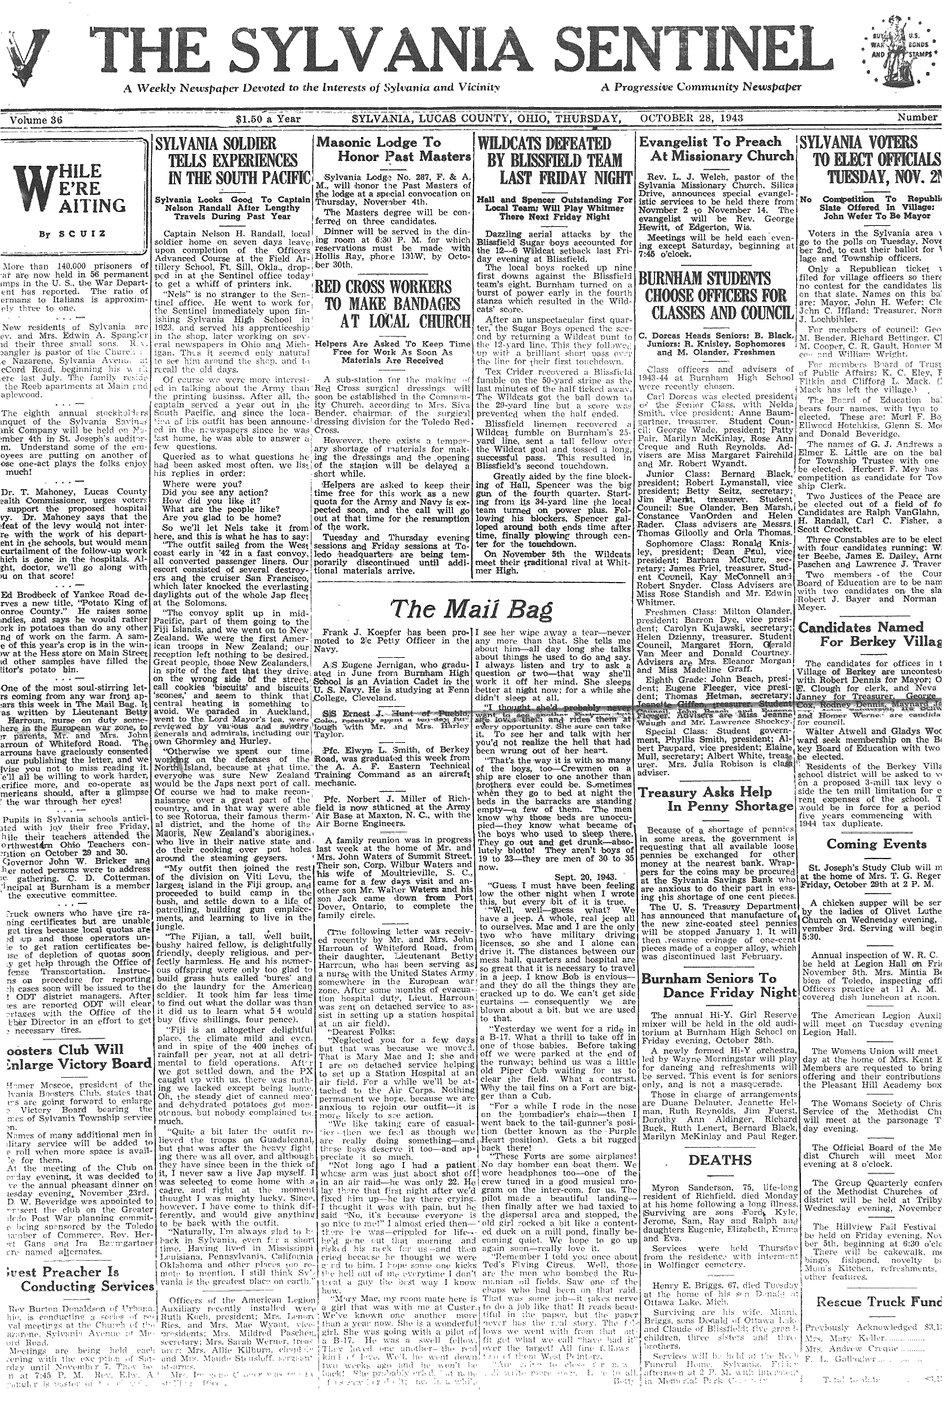 1943 oct 28 sylvania sentinel